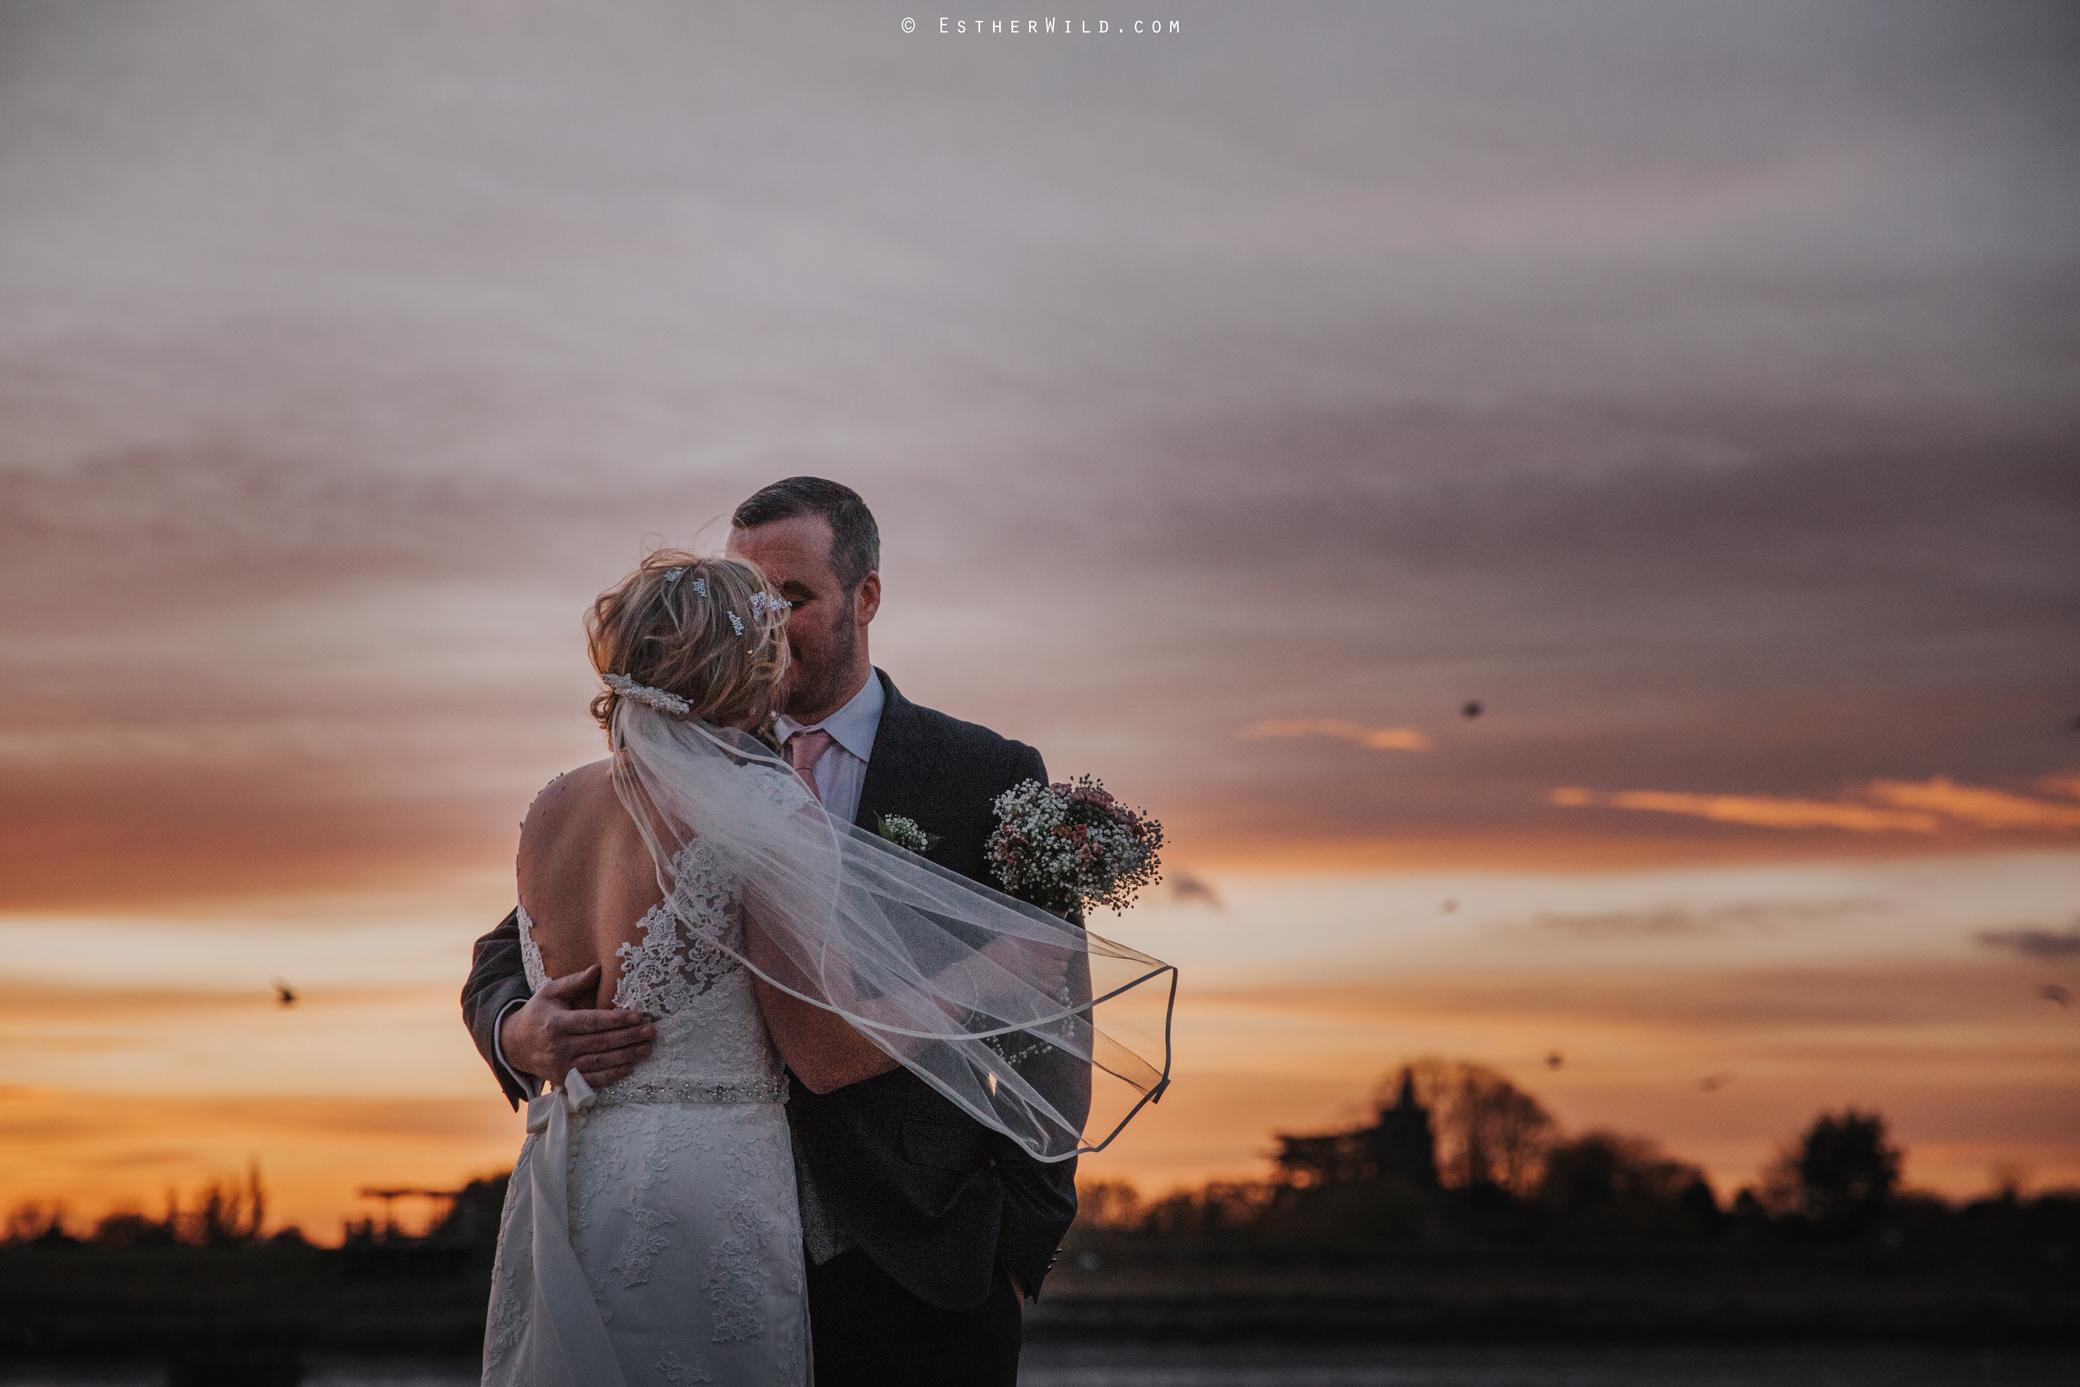 Wedding_Kings_Lynn_Town_Hall_Norfolk_Photographer_Esther_Wild_IMG_1291.jpg